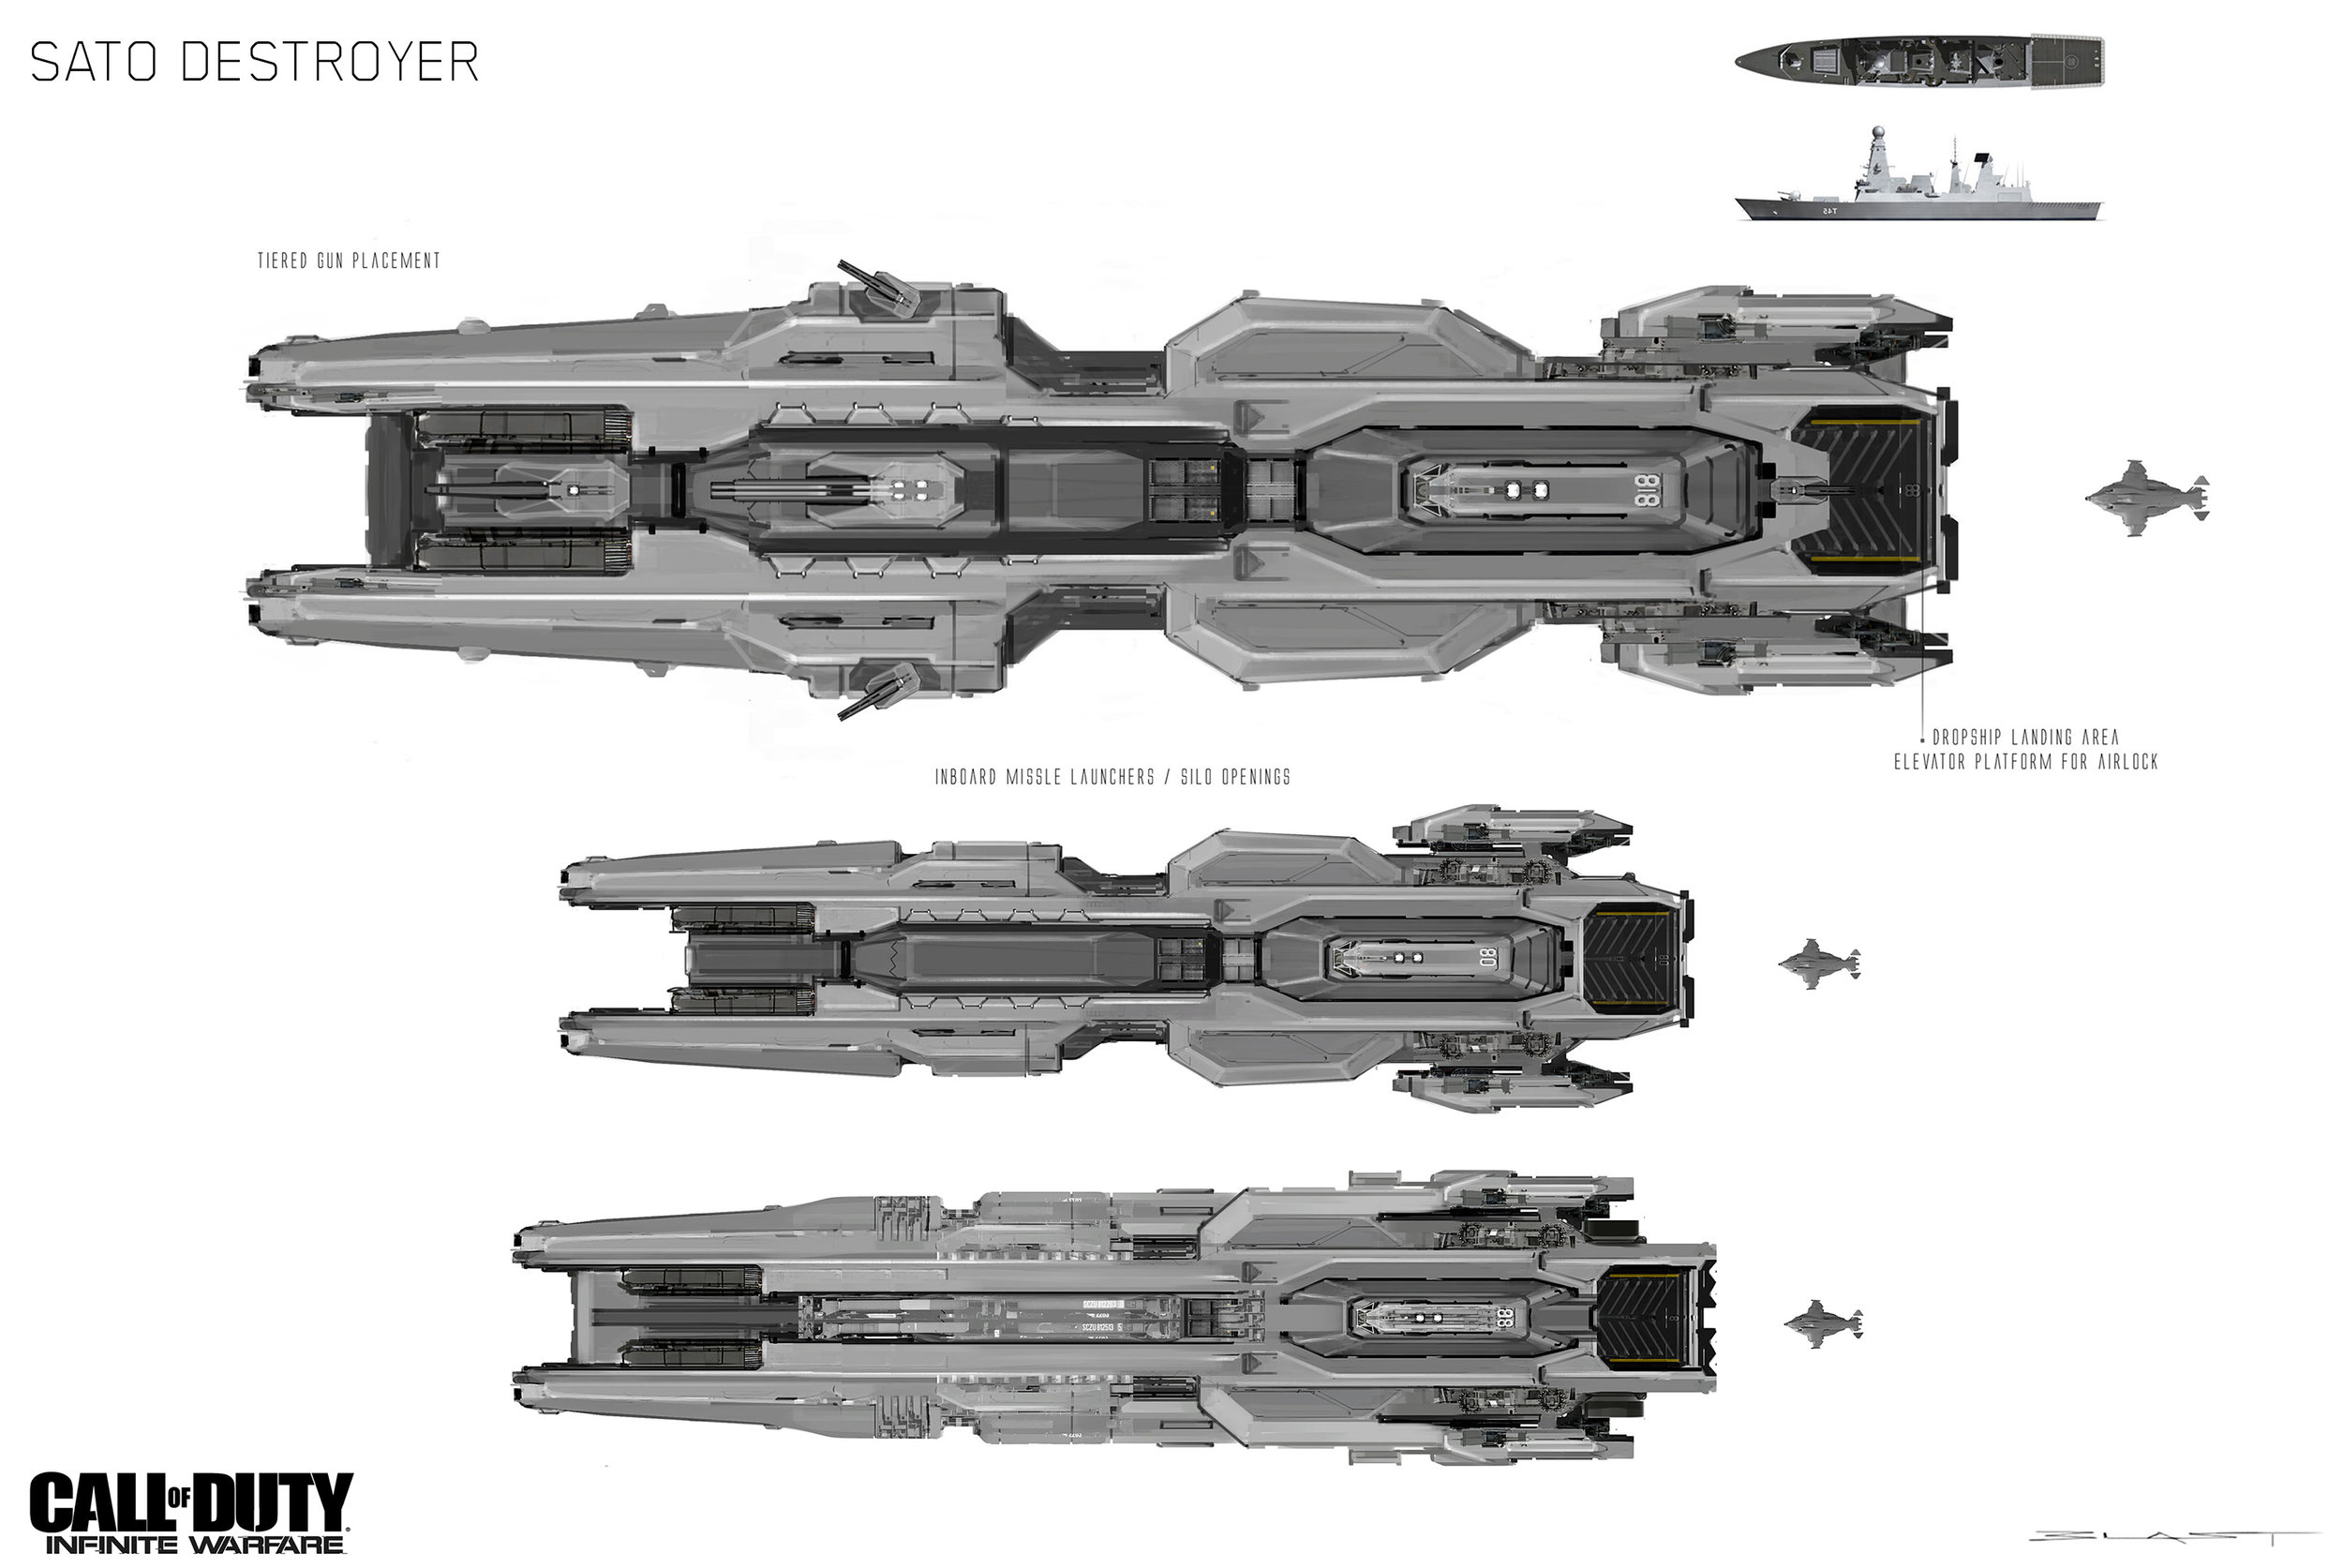 callofduty_conceptdesign_benjaminlast_spaceship